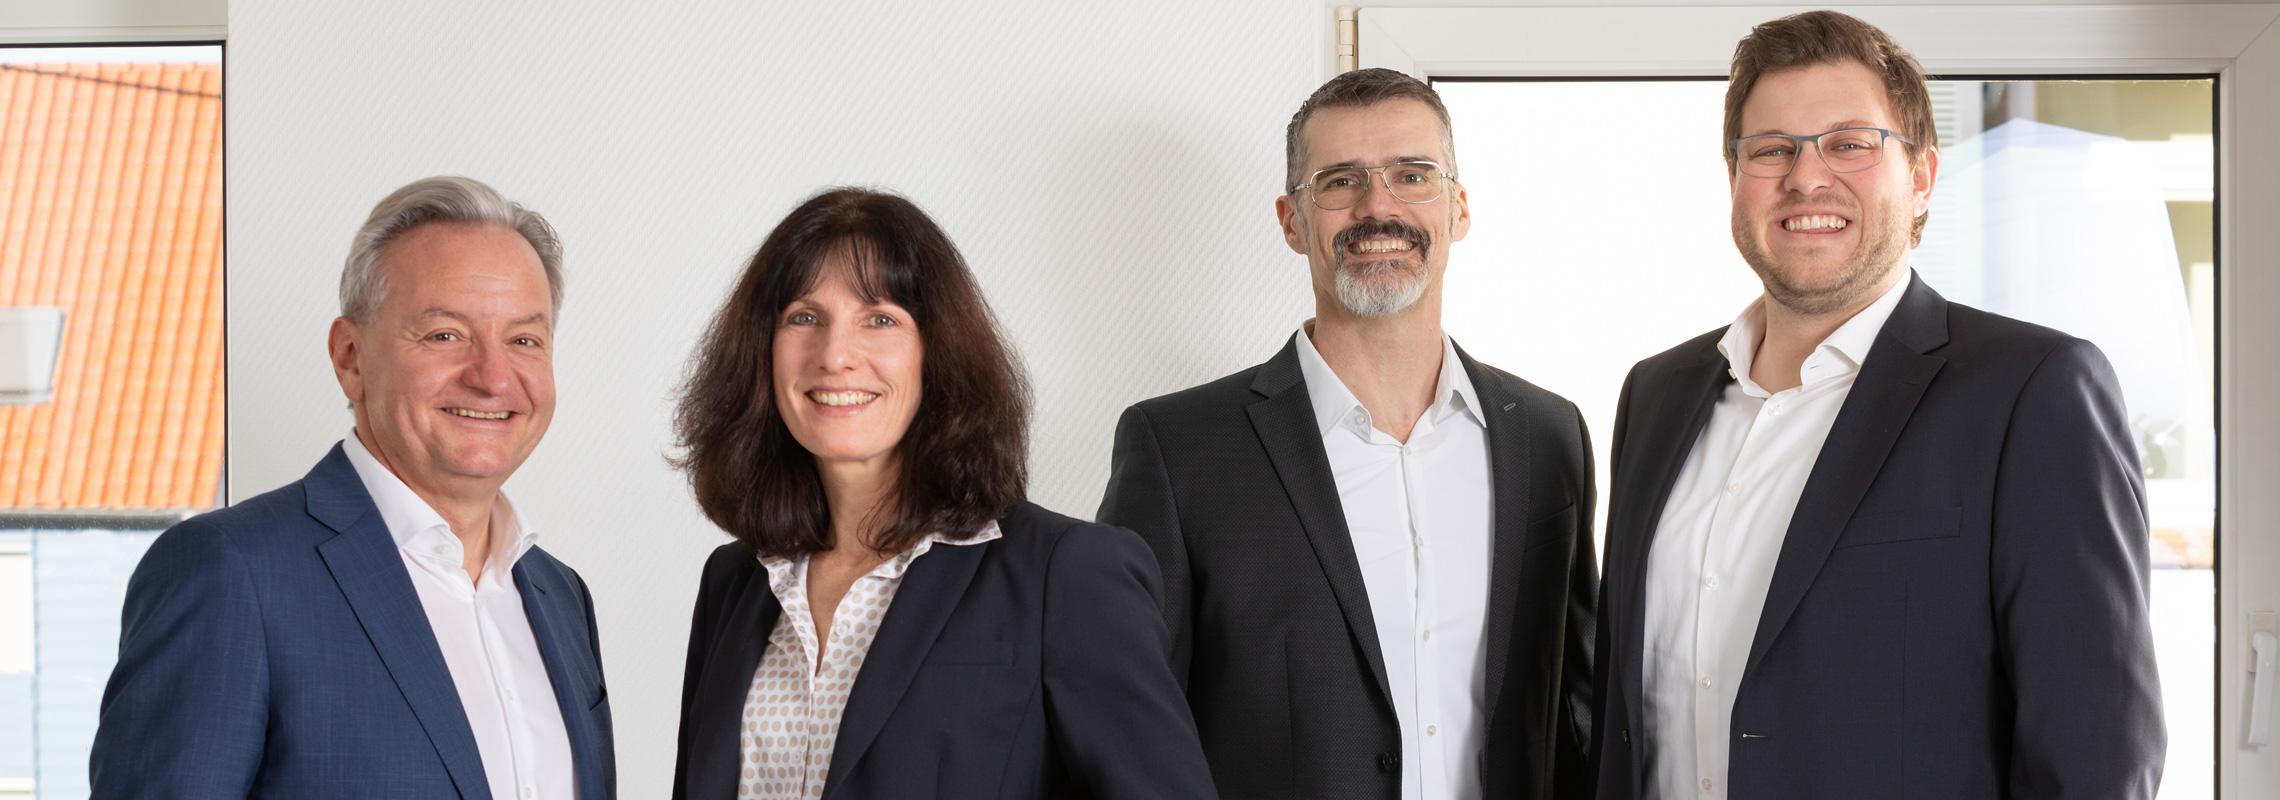 Gaertner Immobilienmanagement GmbH